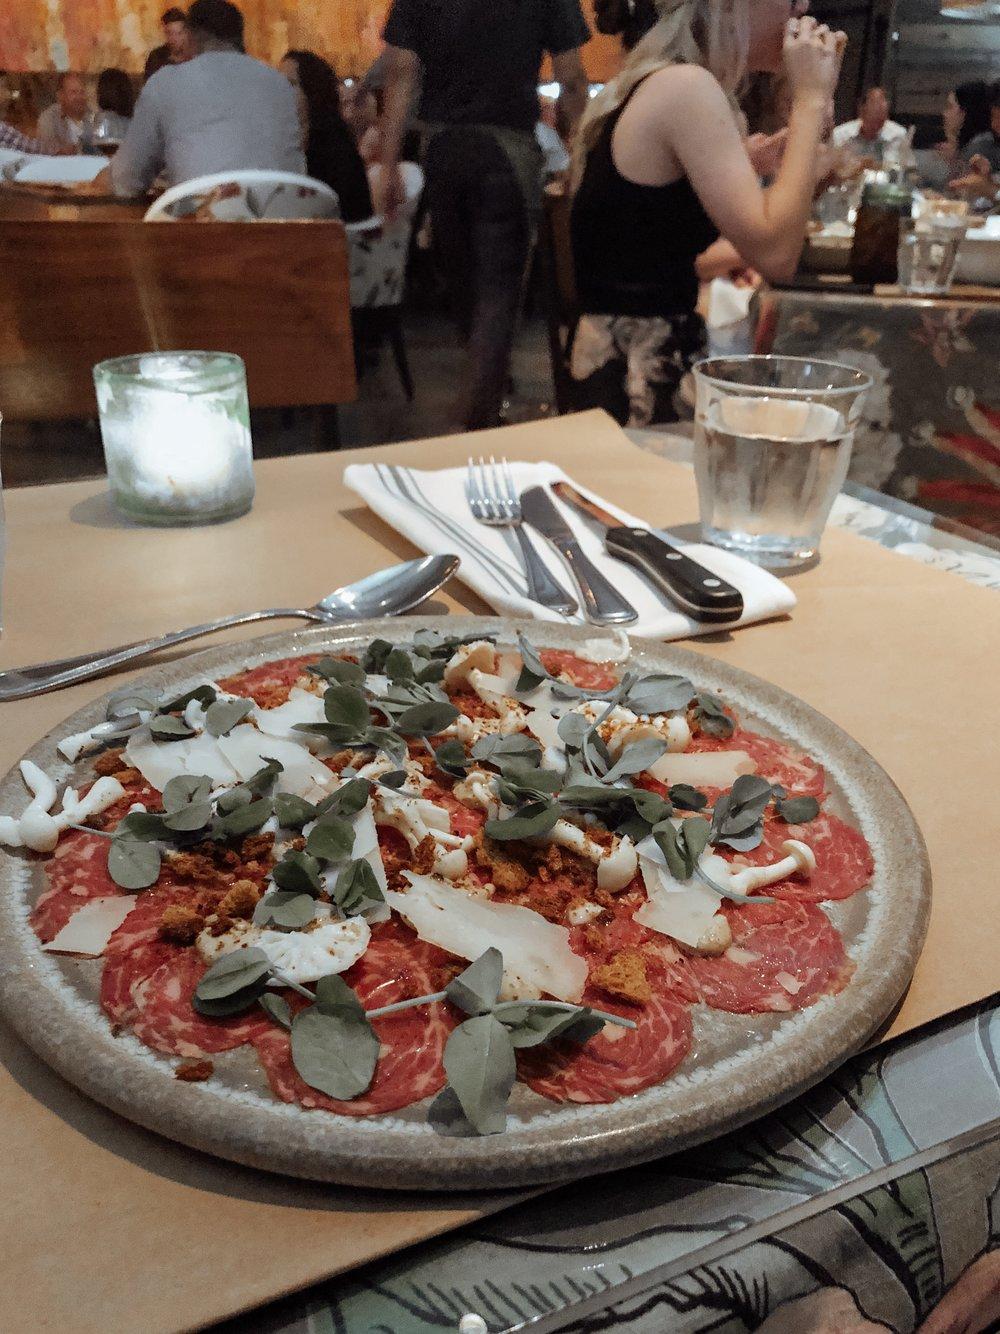 Carpaccio at Cucina Urbana